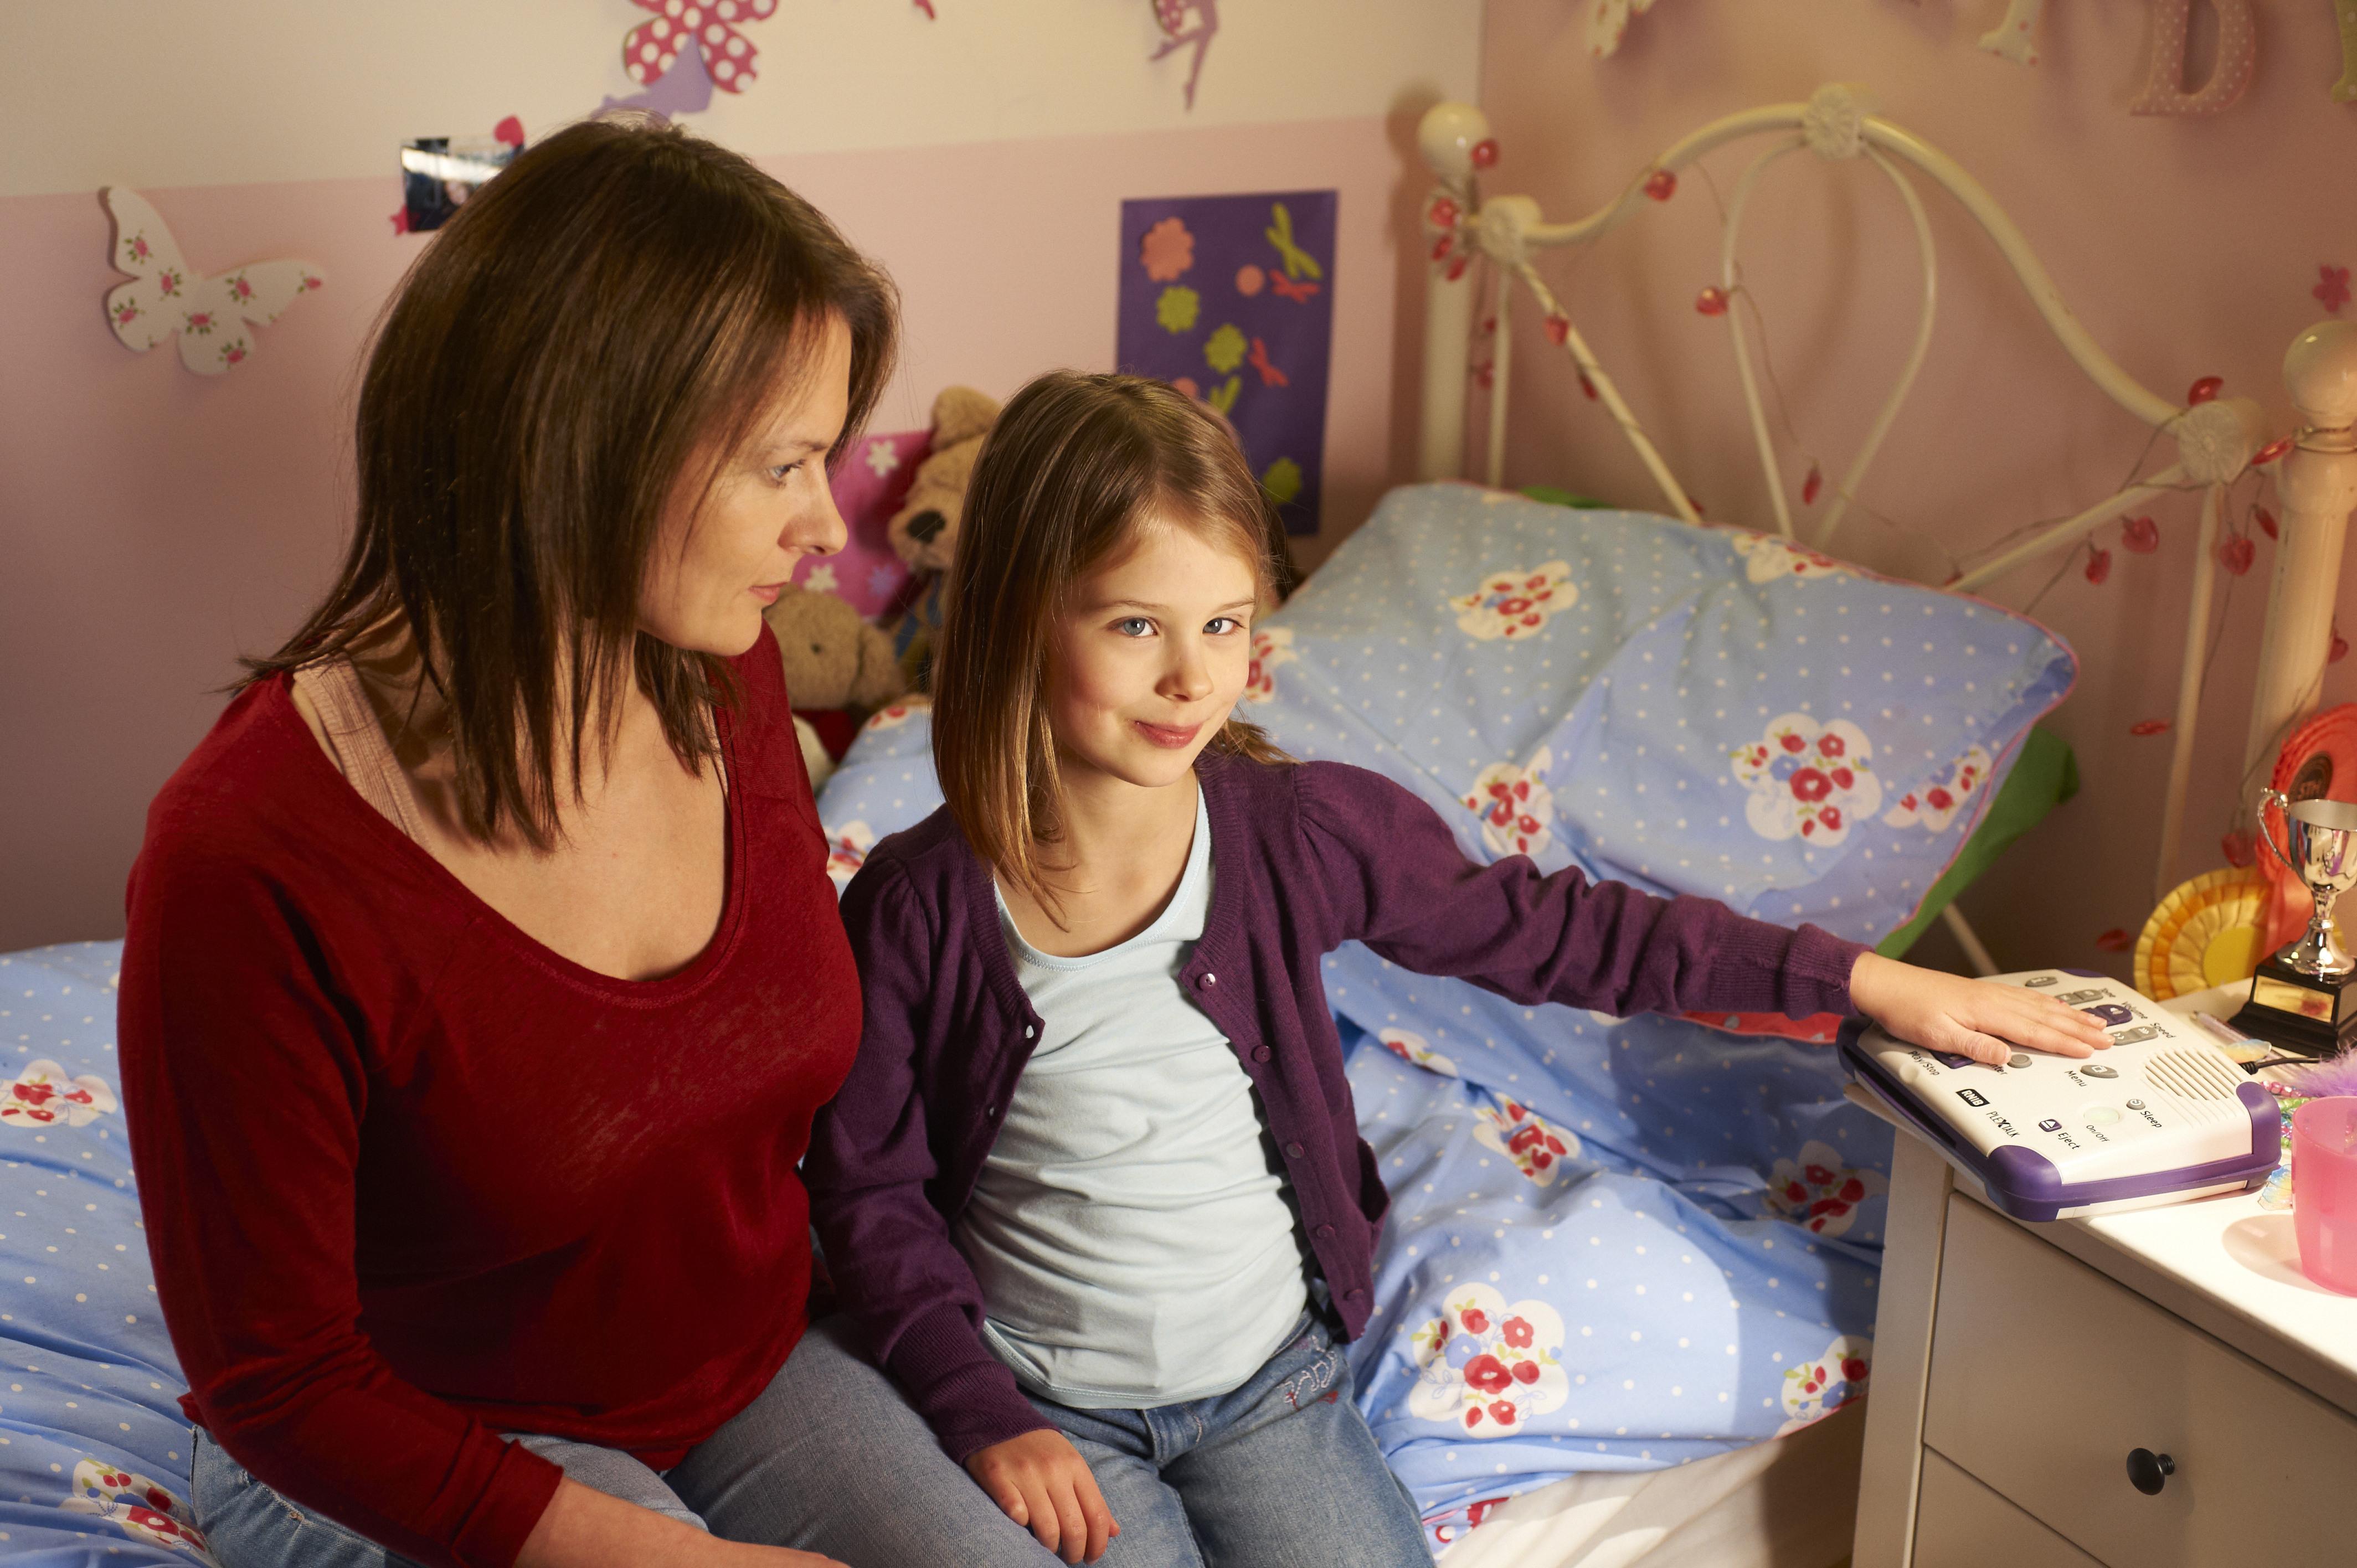 Child's letter inspires RNIB advertising campaign